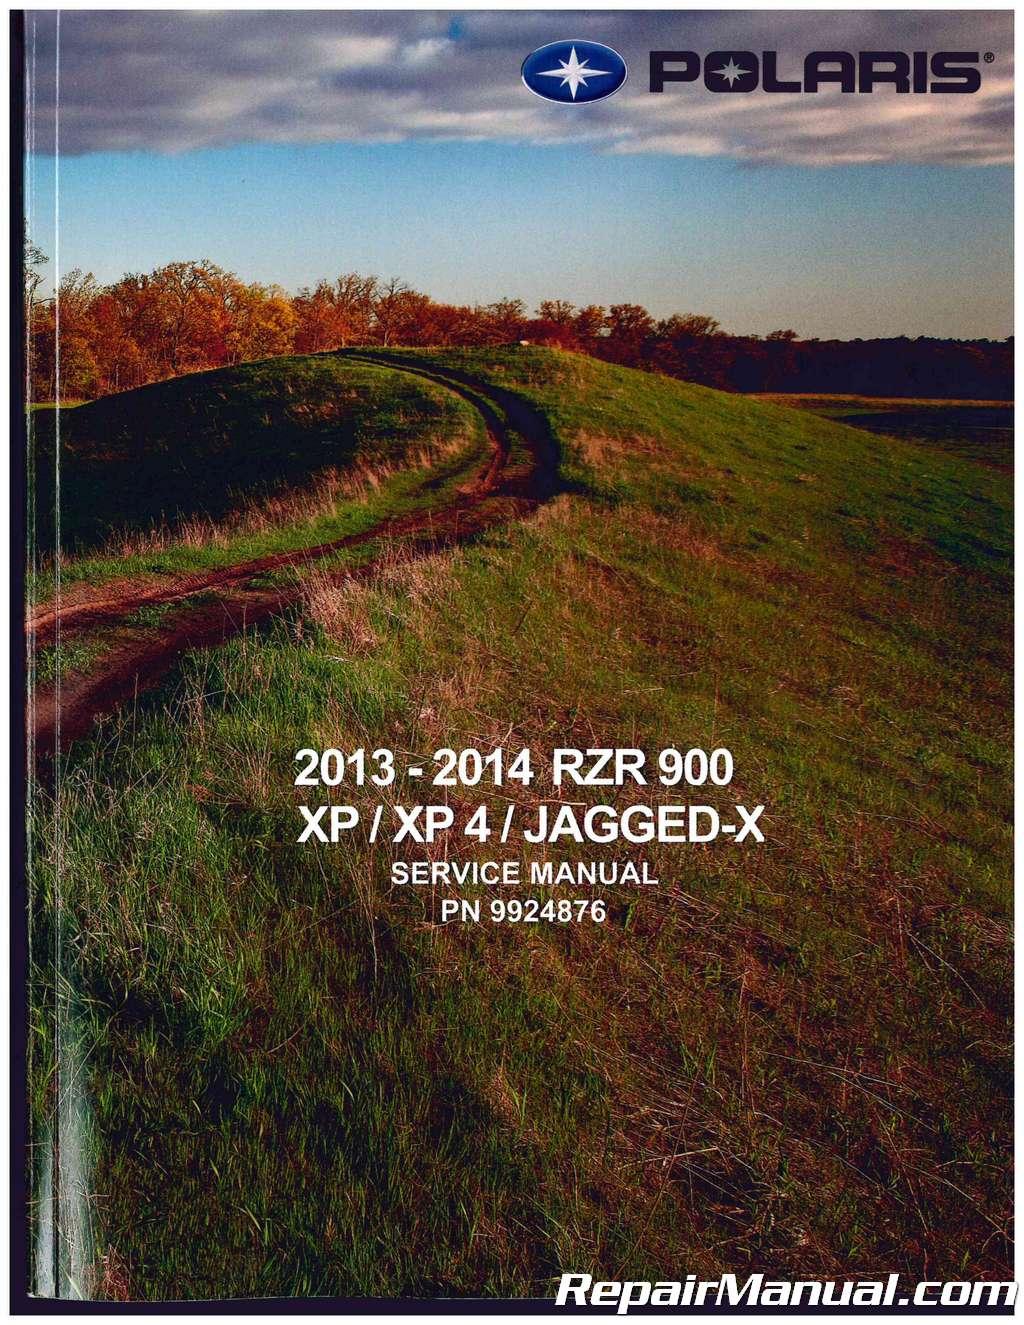 2013 2014 polaris ranger rzr 900 xp xp4 jagged x service manual rh repairmanual com Polaris RZR 900 2013 Polaris XP 900